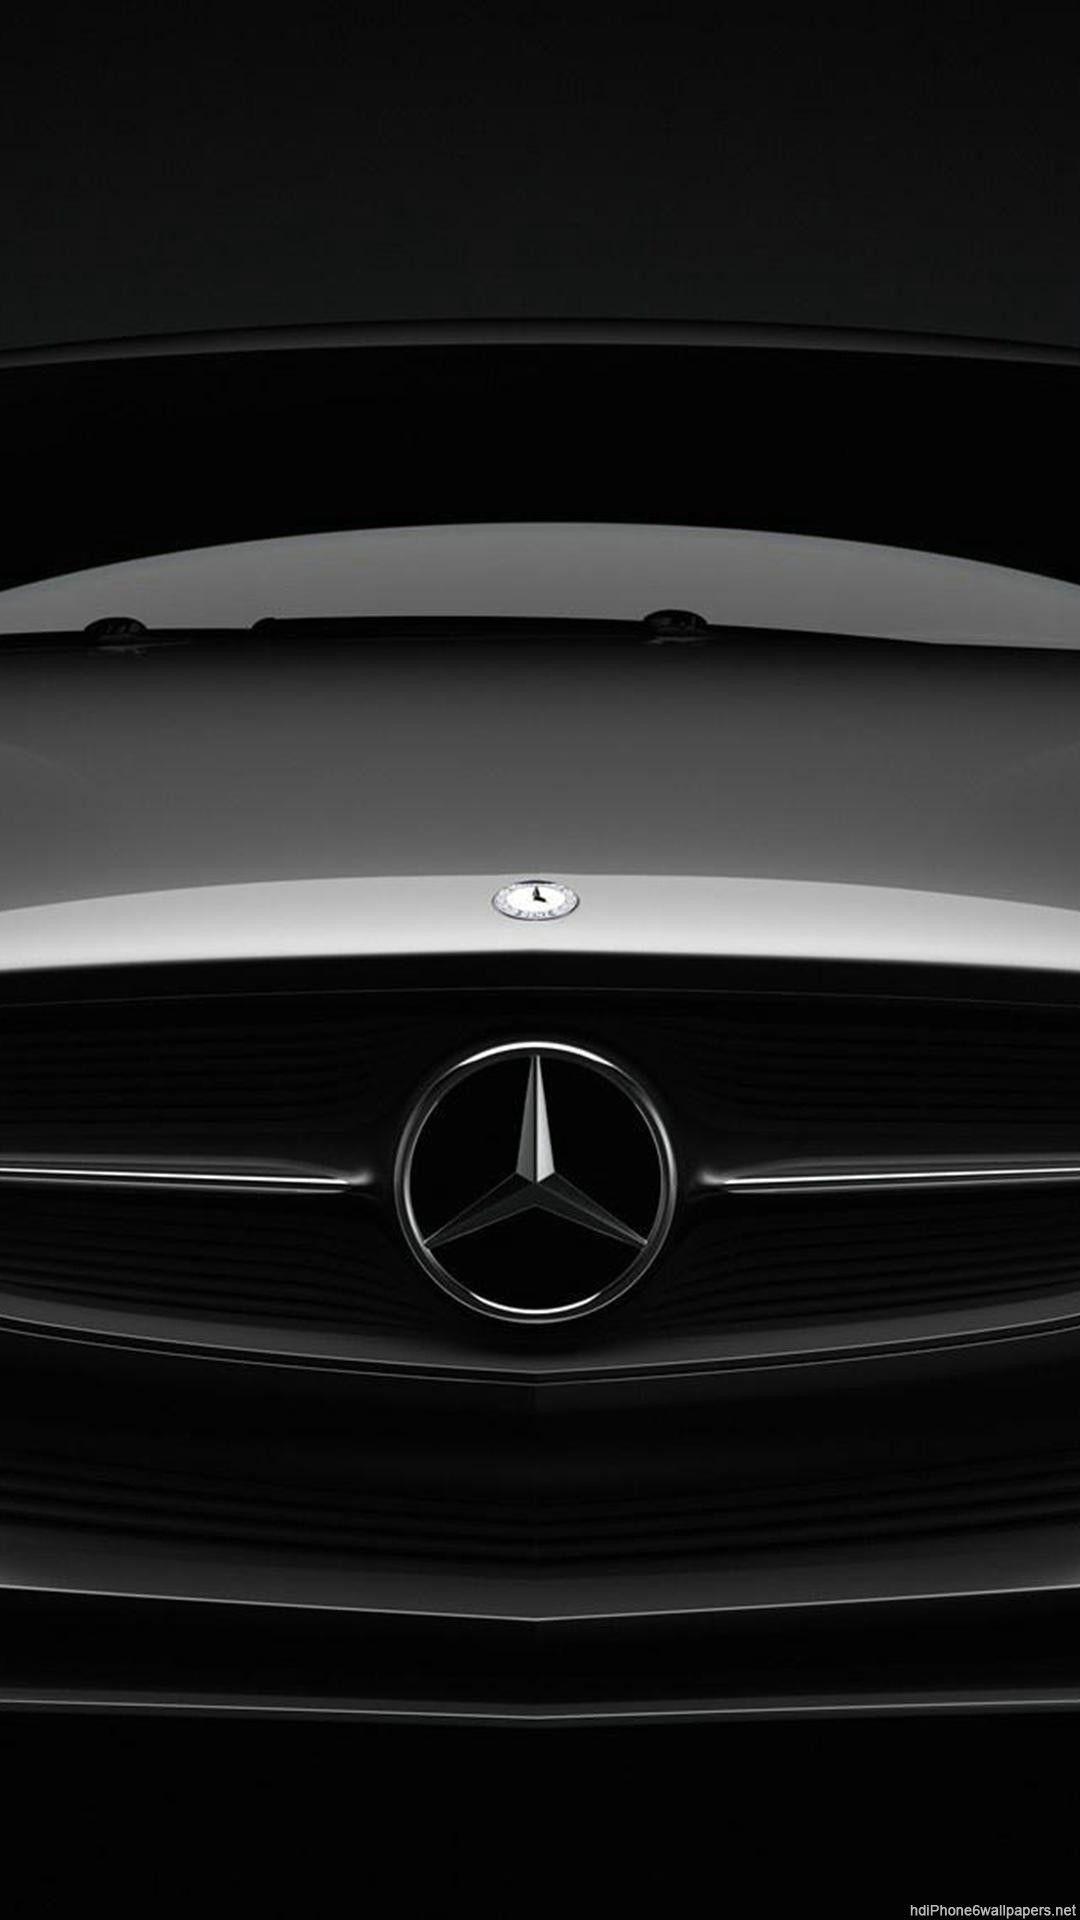 Mercedes Benz Iphone Wallpaper 42769 Mercedes Benz Wallpaper